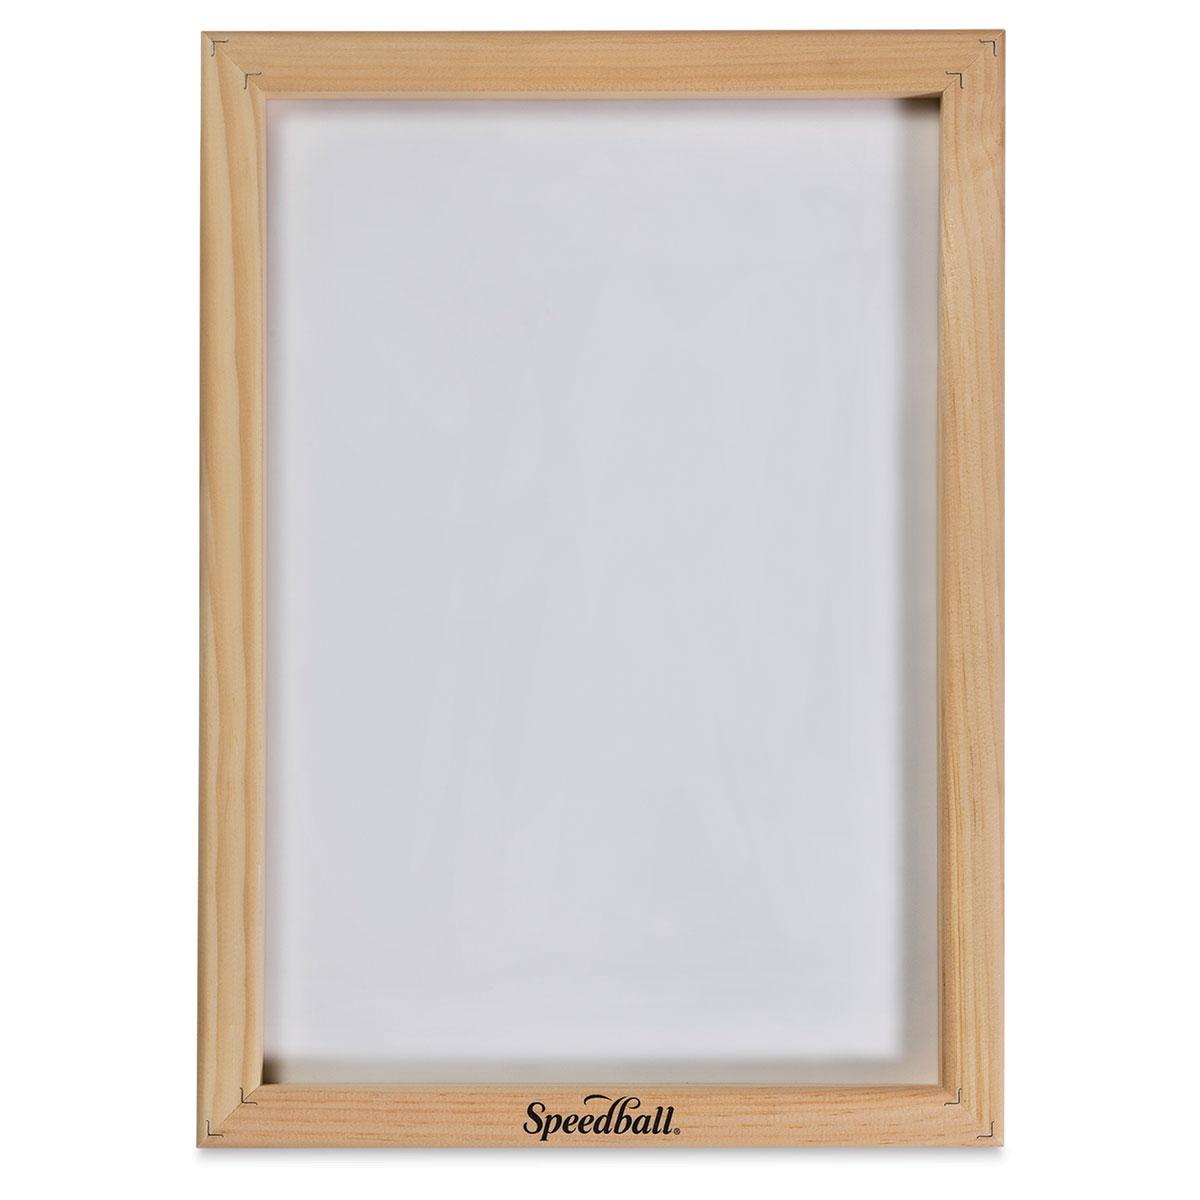 Speedball Screenprinting Frame - 110 Monofilament - 10 x 14